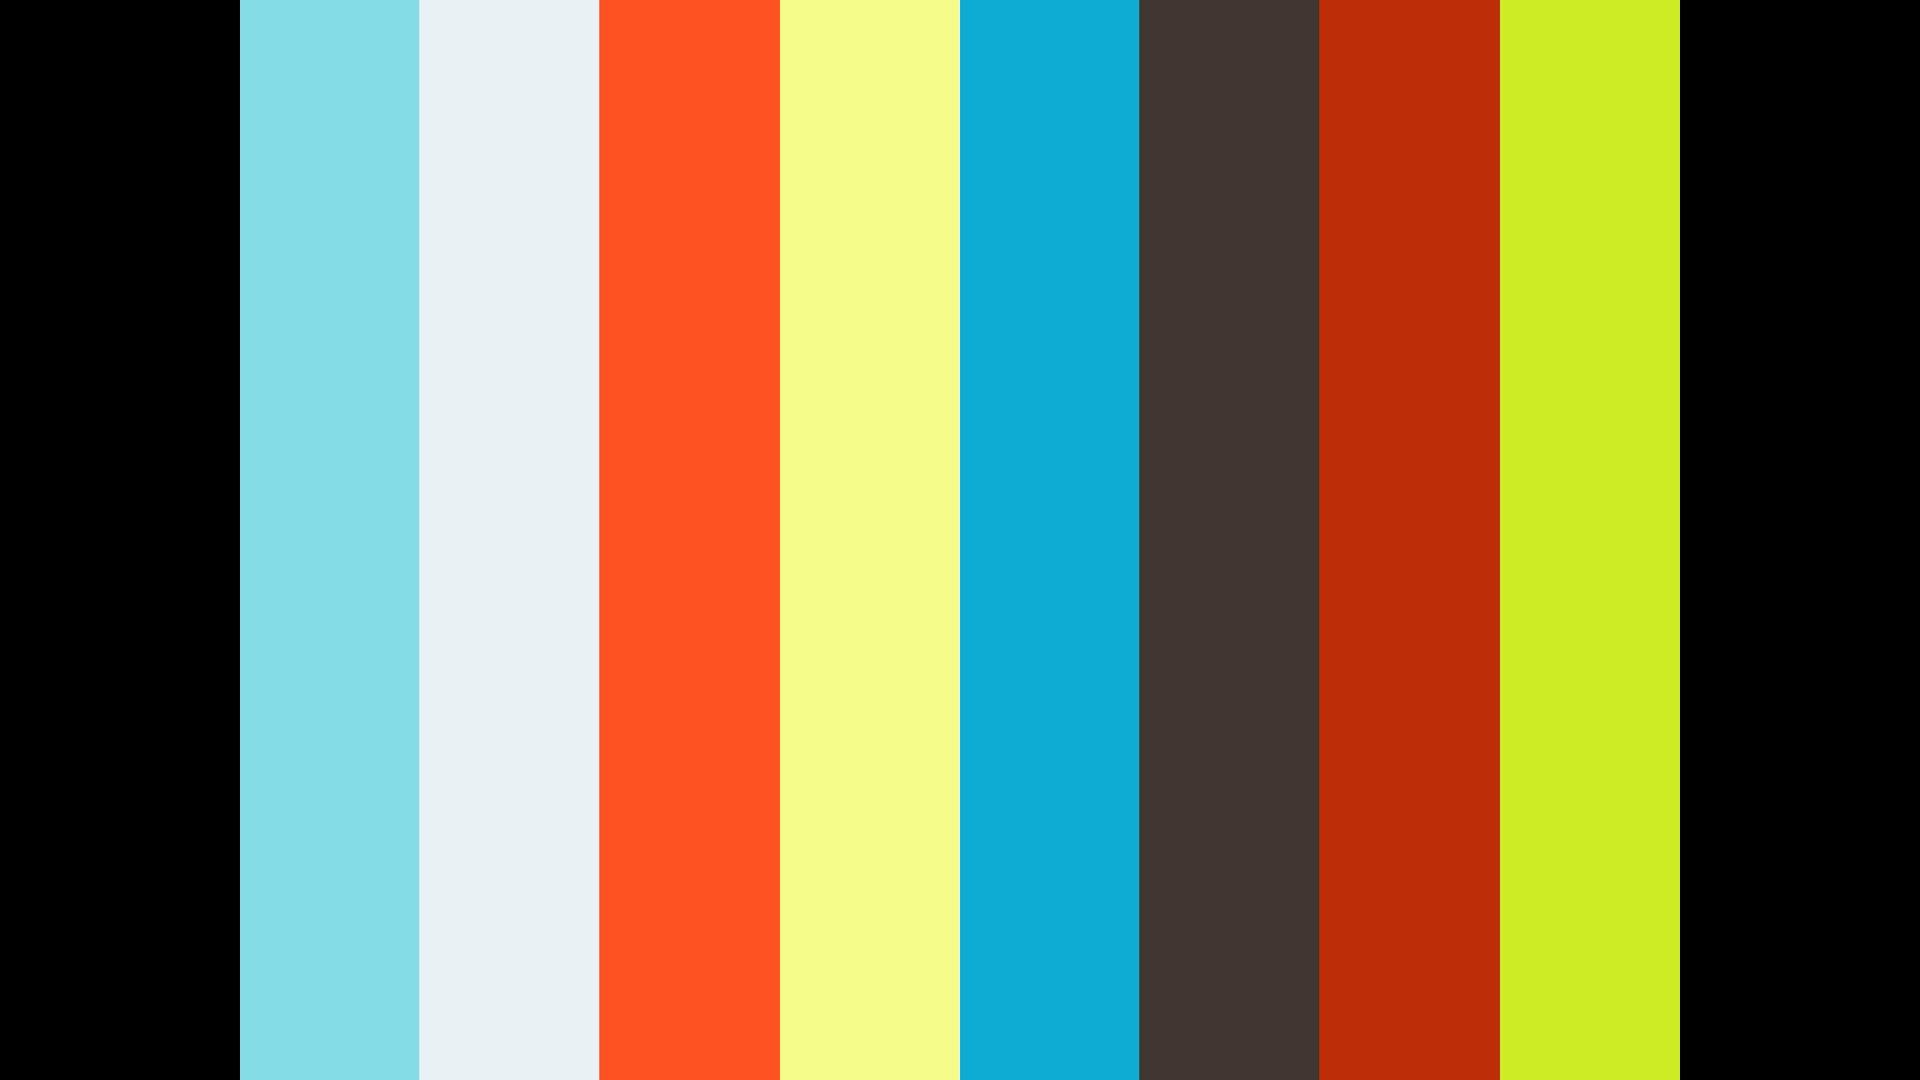 IRDG_brand_animation_WITH_MUSIC.mp4